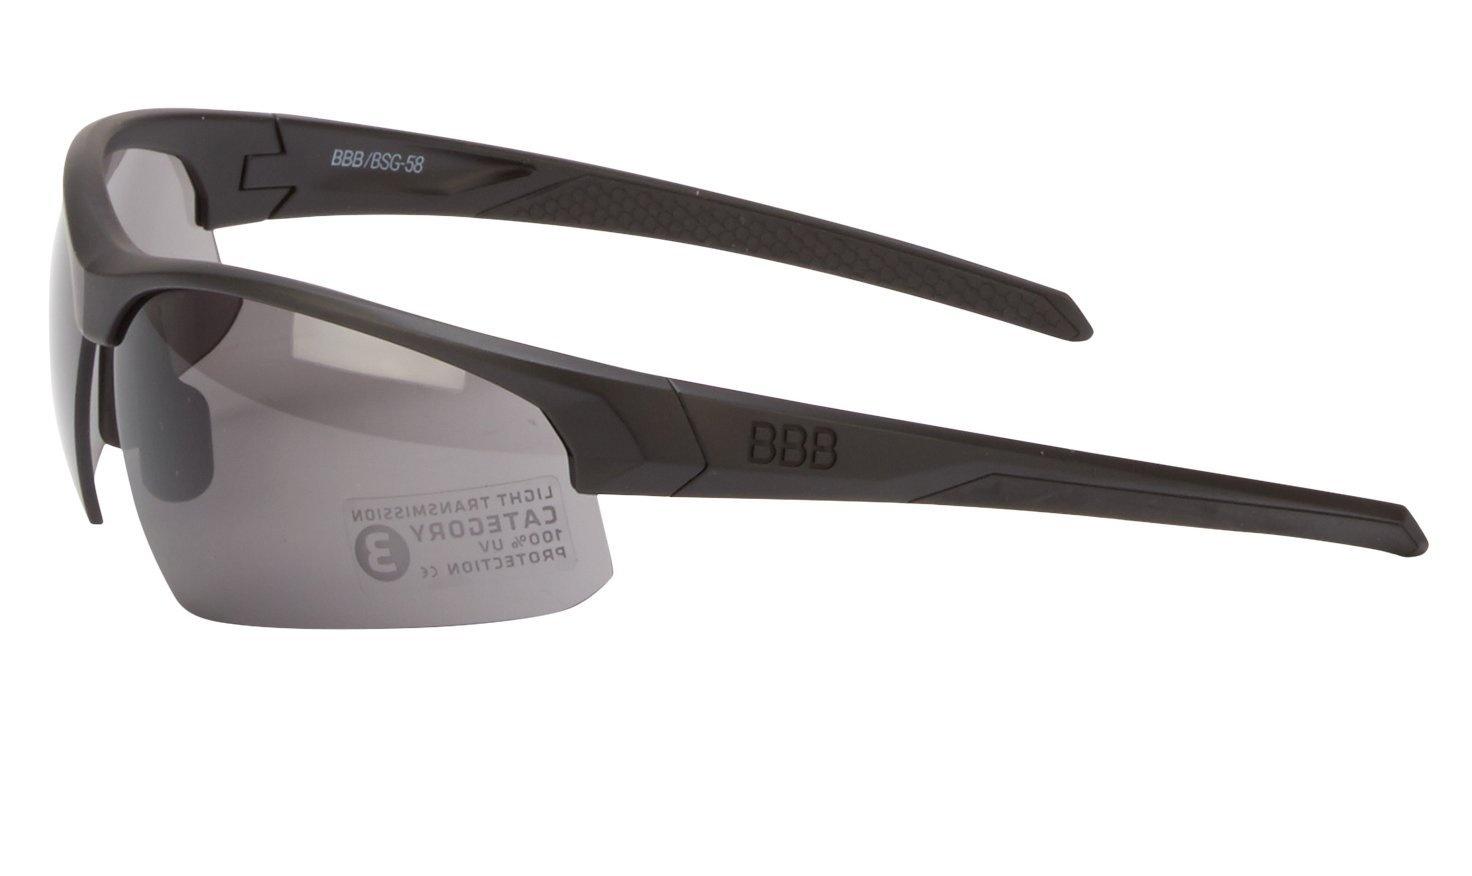 BBB Impress Cykelbriller med 3 sæt linser - Matsort